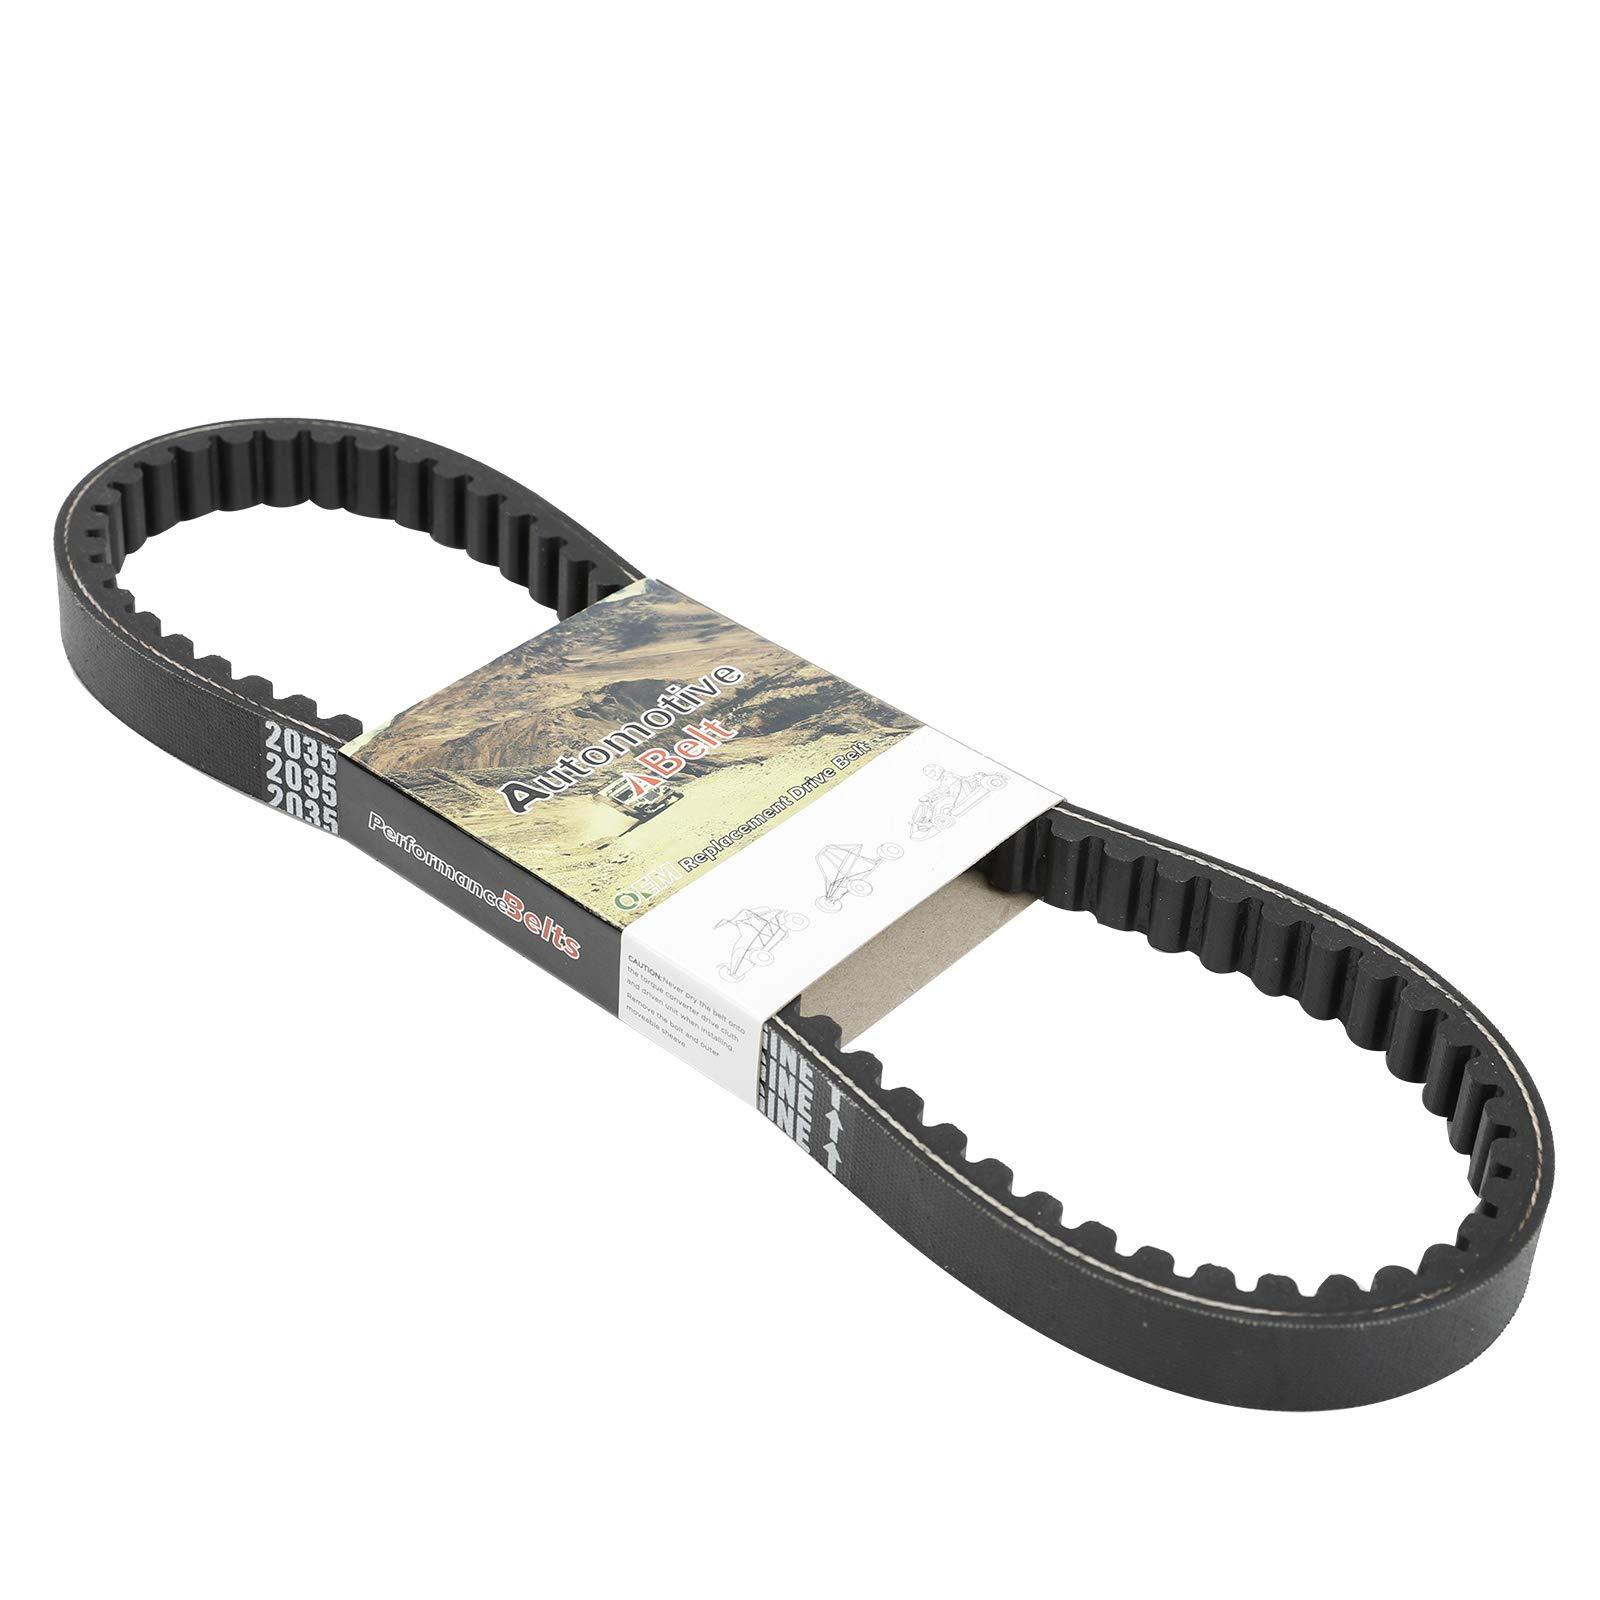 Belts BLACKHORSE-RACING 203591 Q430203W Go Kart Drive Belt for ...